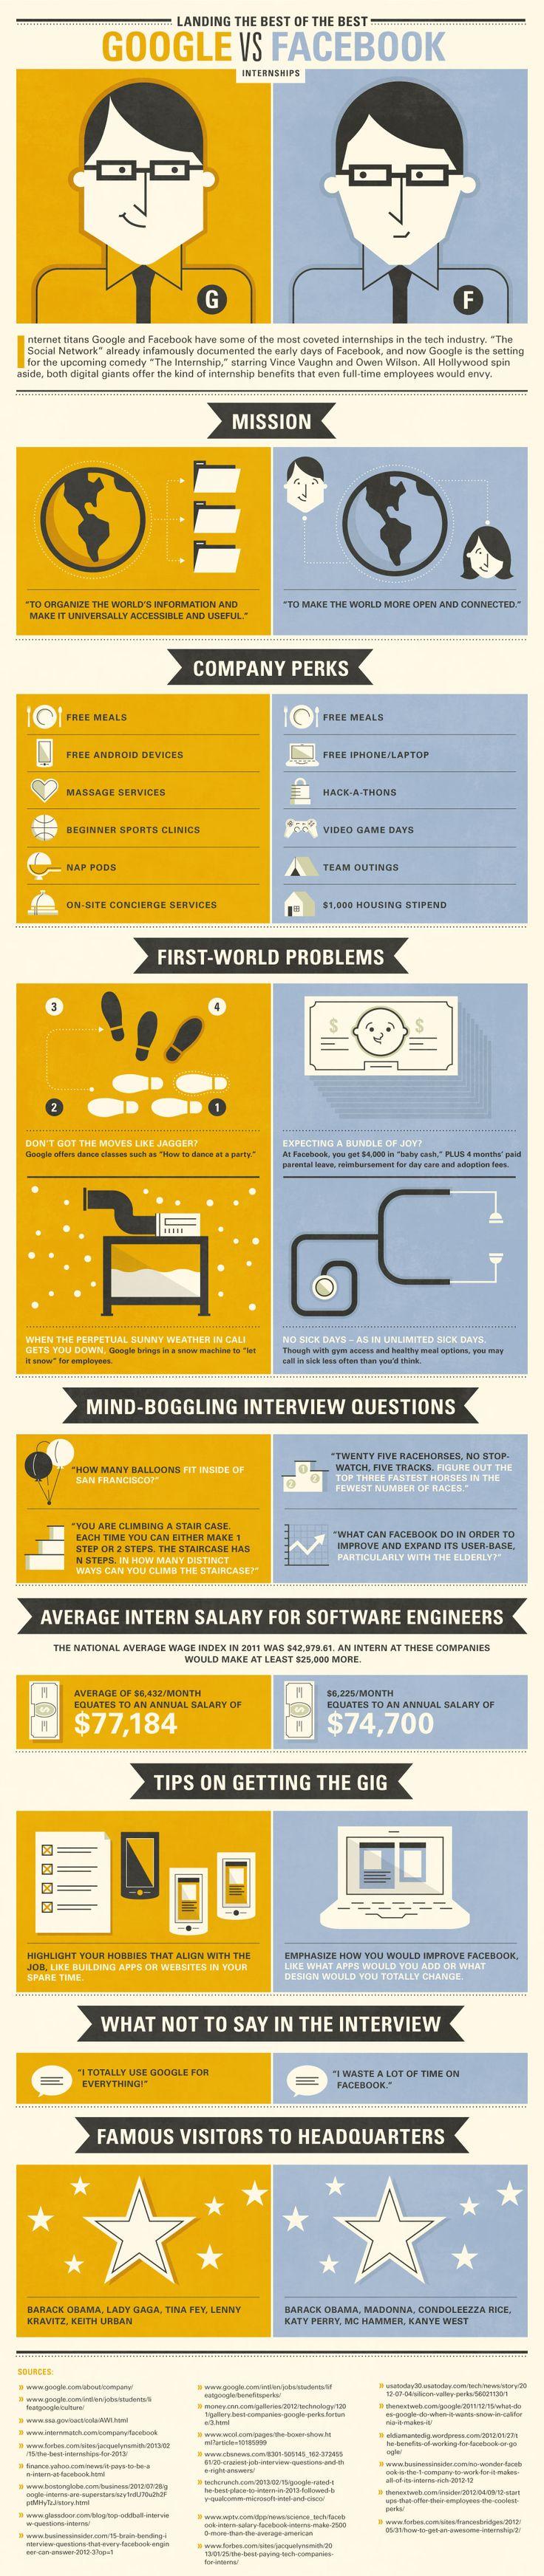 Google vs. Facebook Internships: Perks & Pay Comparison #infographic